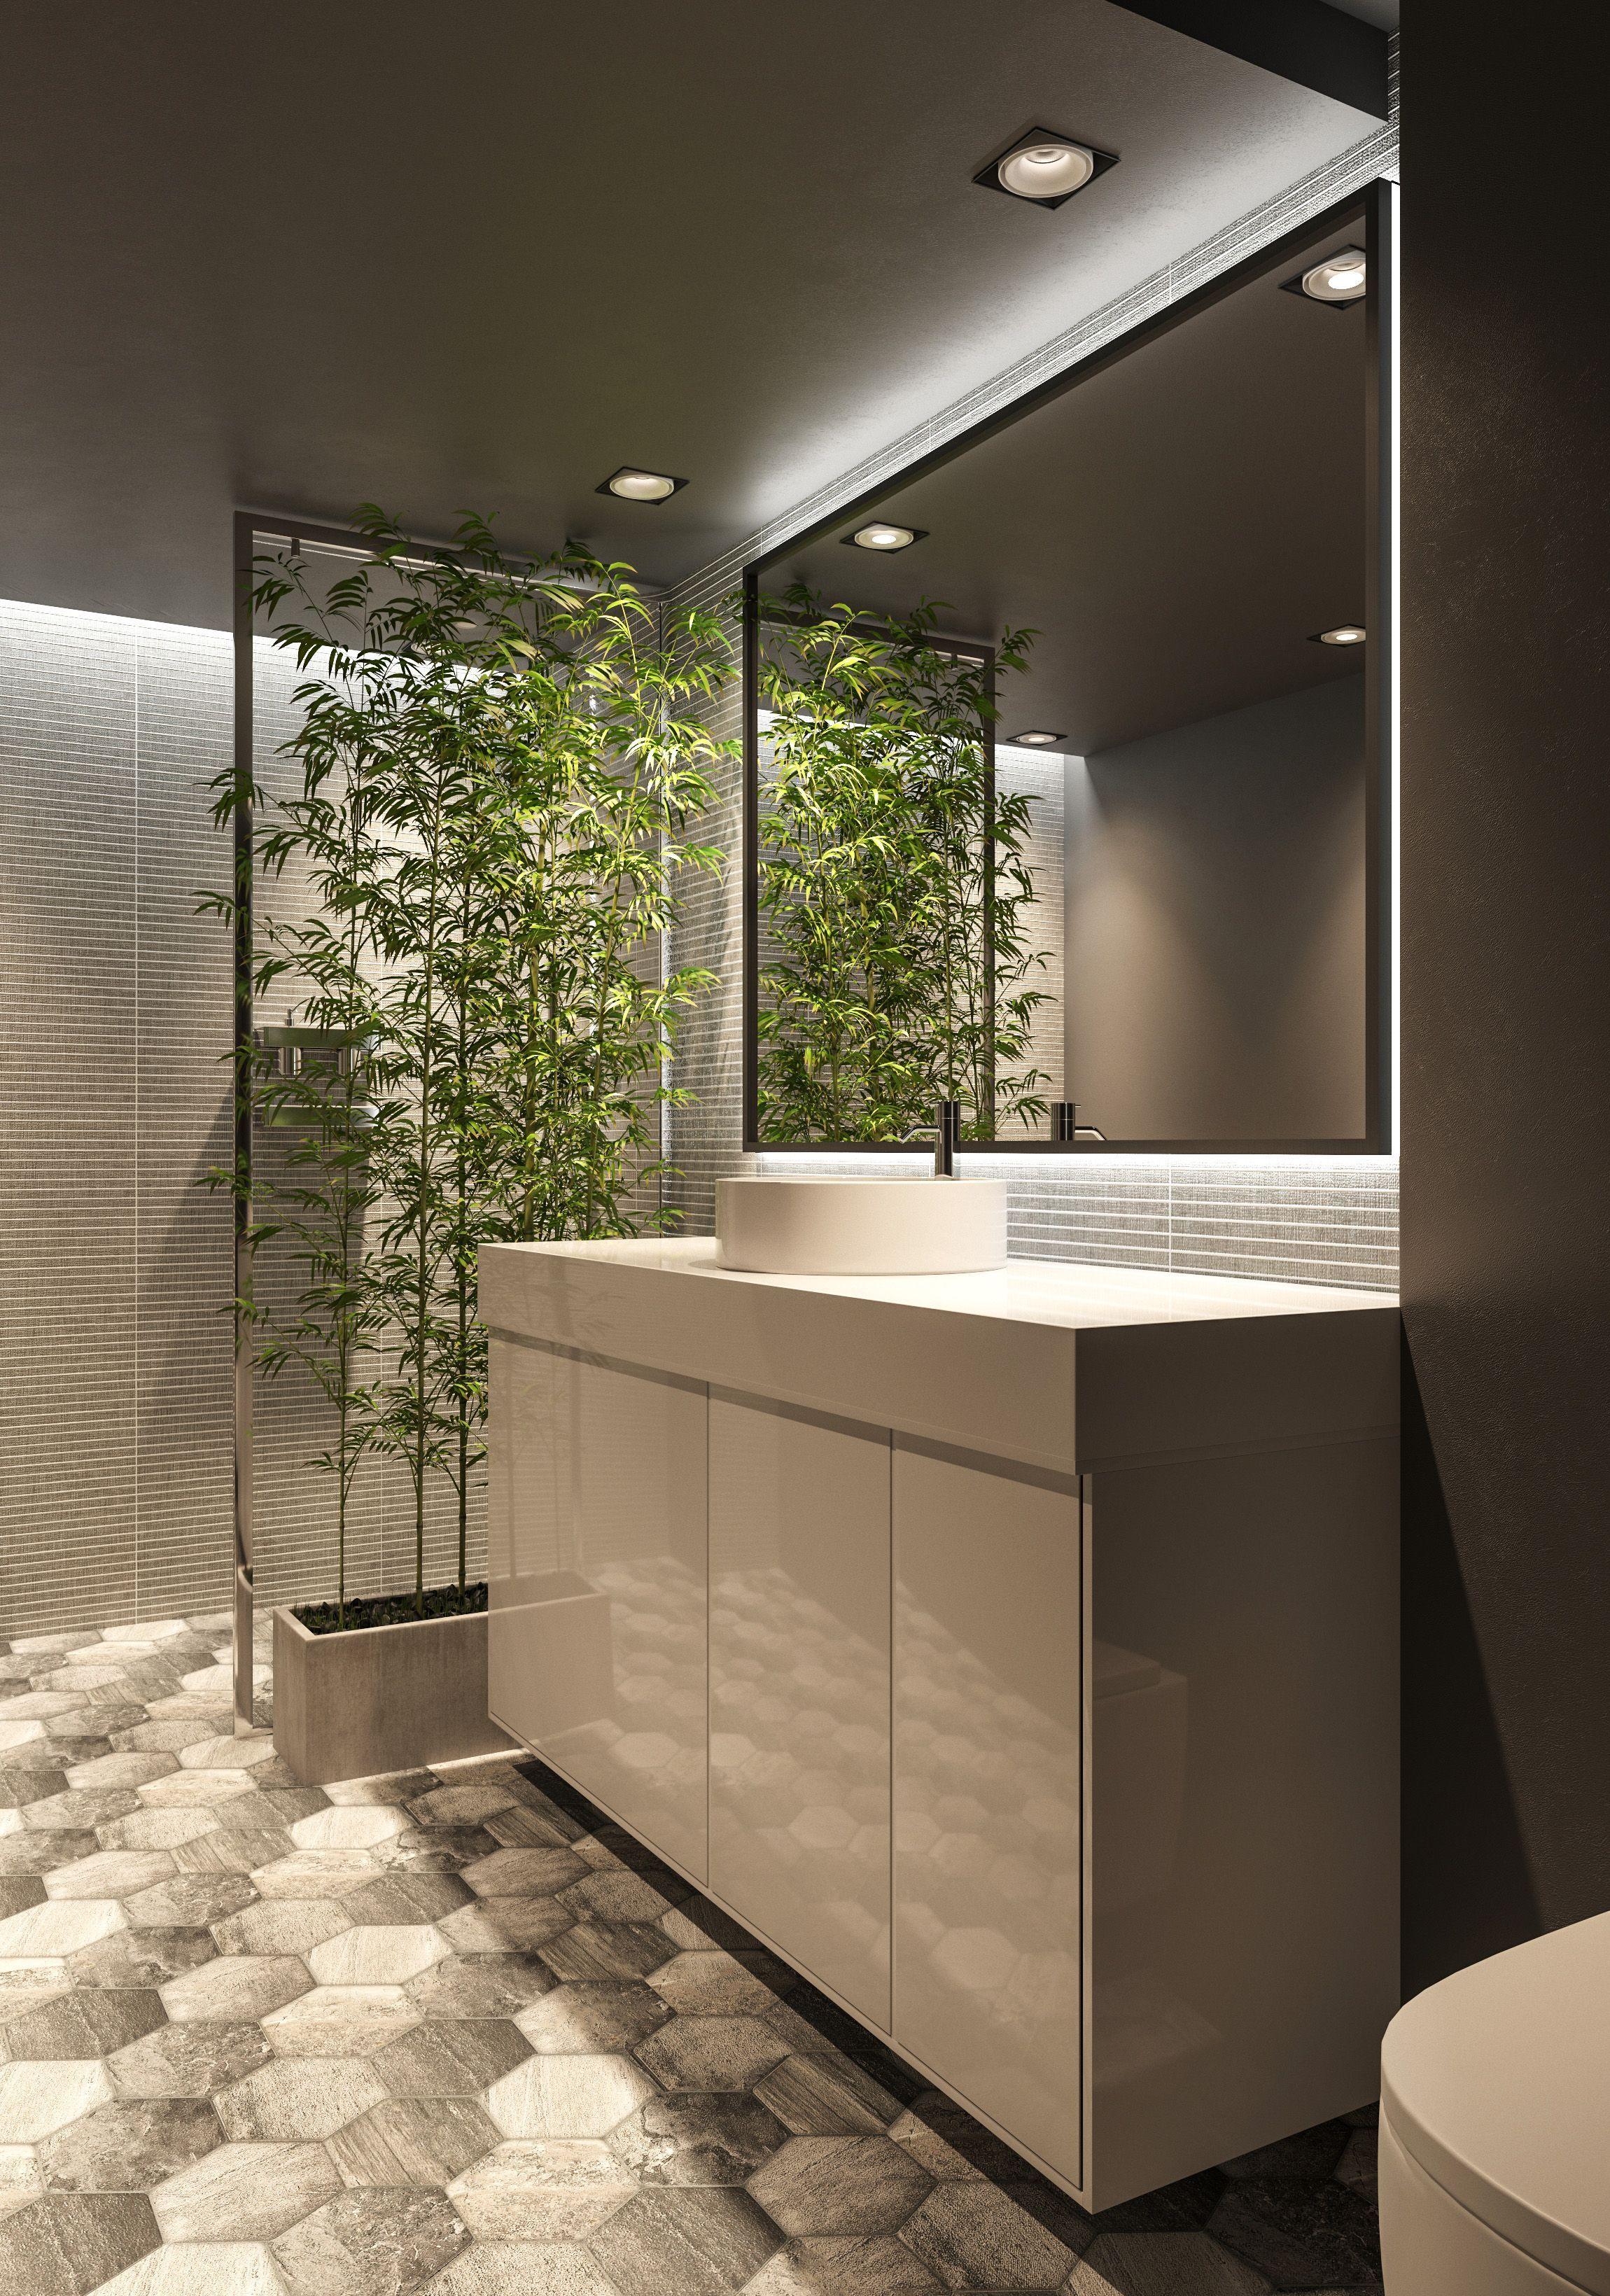 Epic Bathroom Renovations - June, 12 in 12 | Bathroom ...